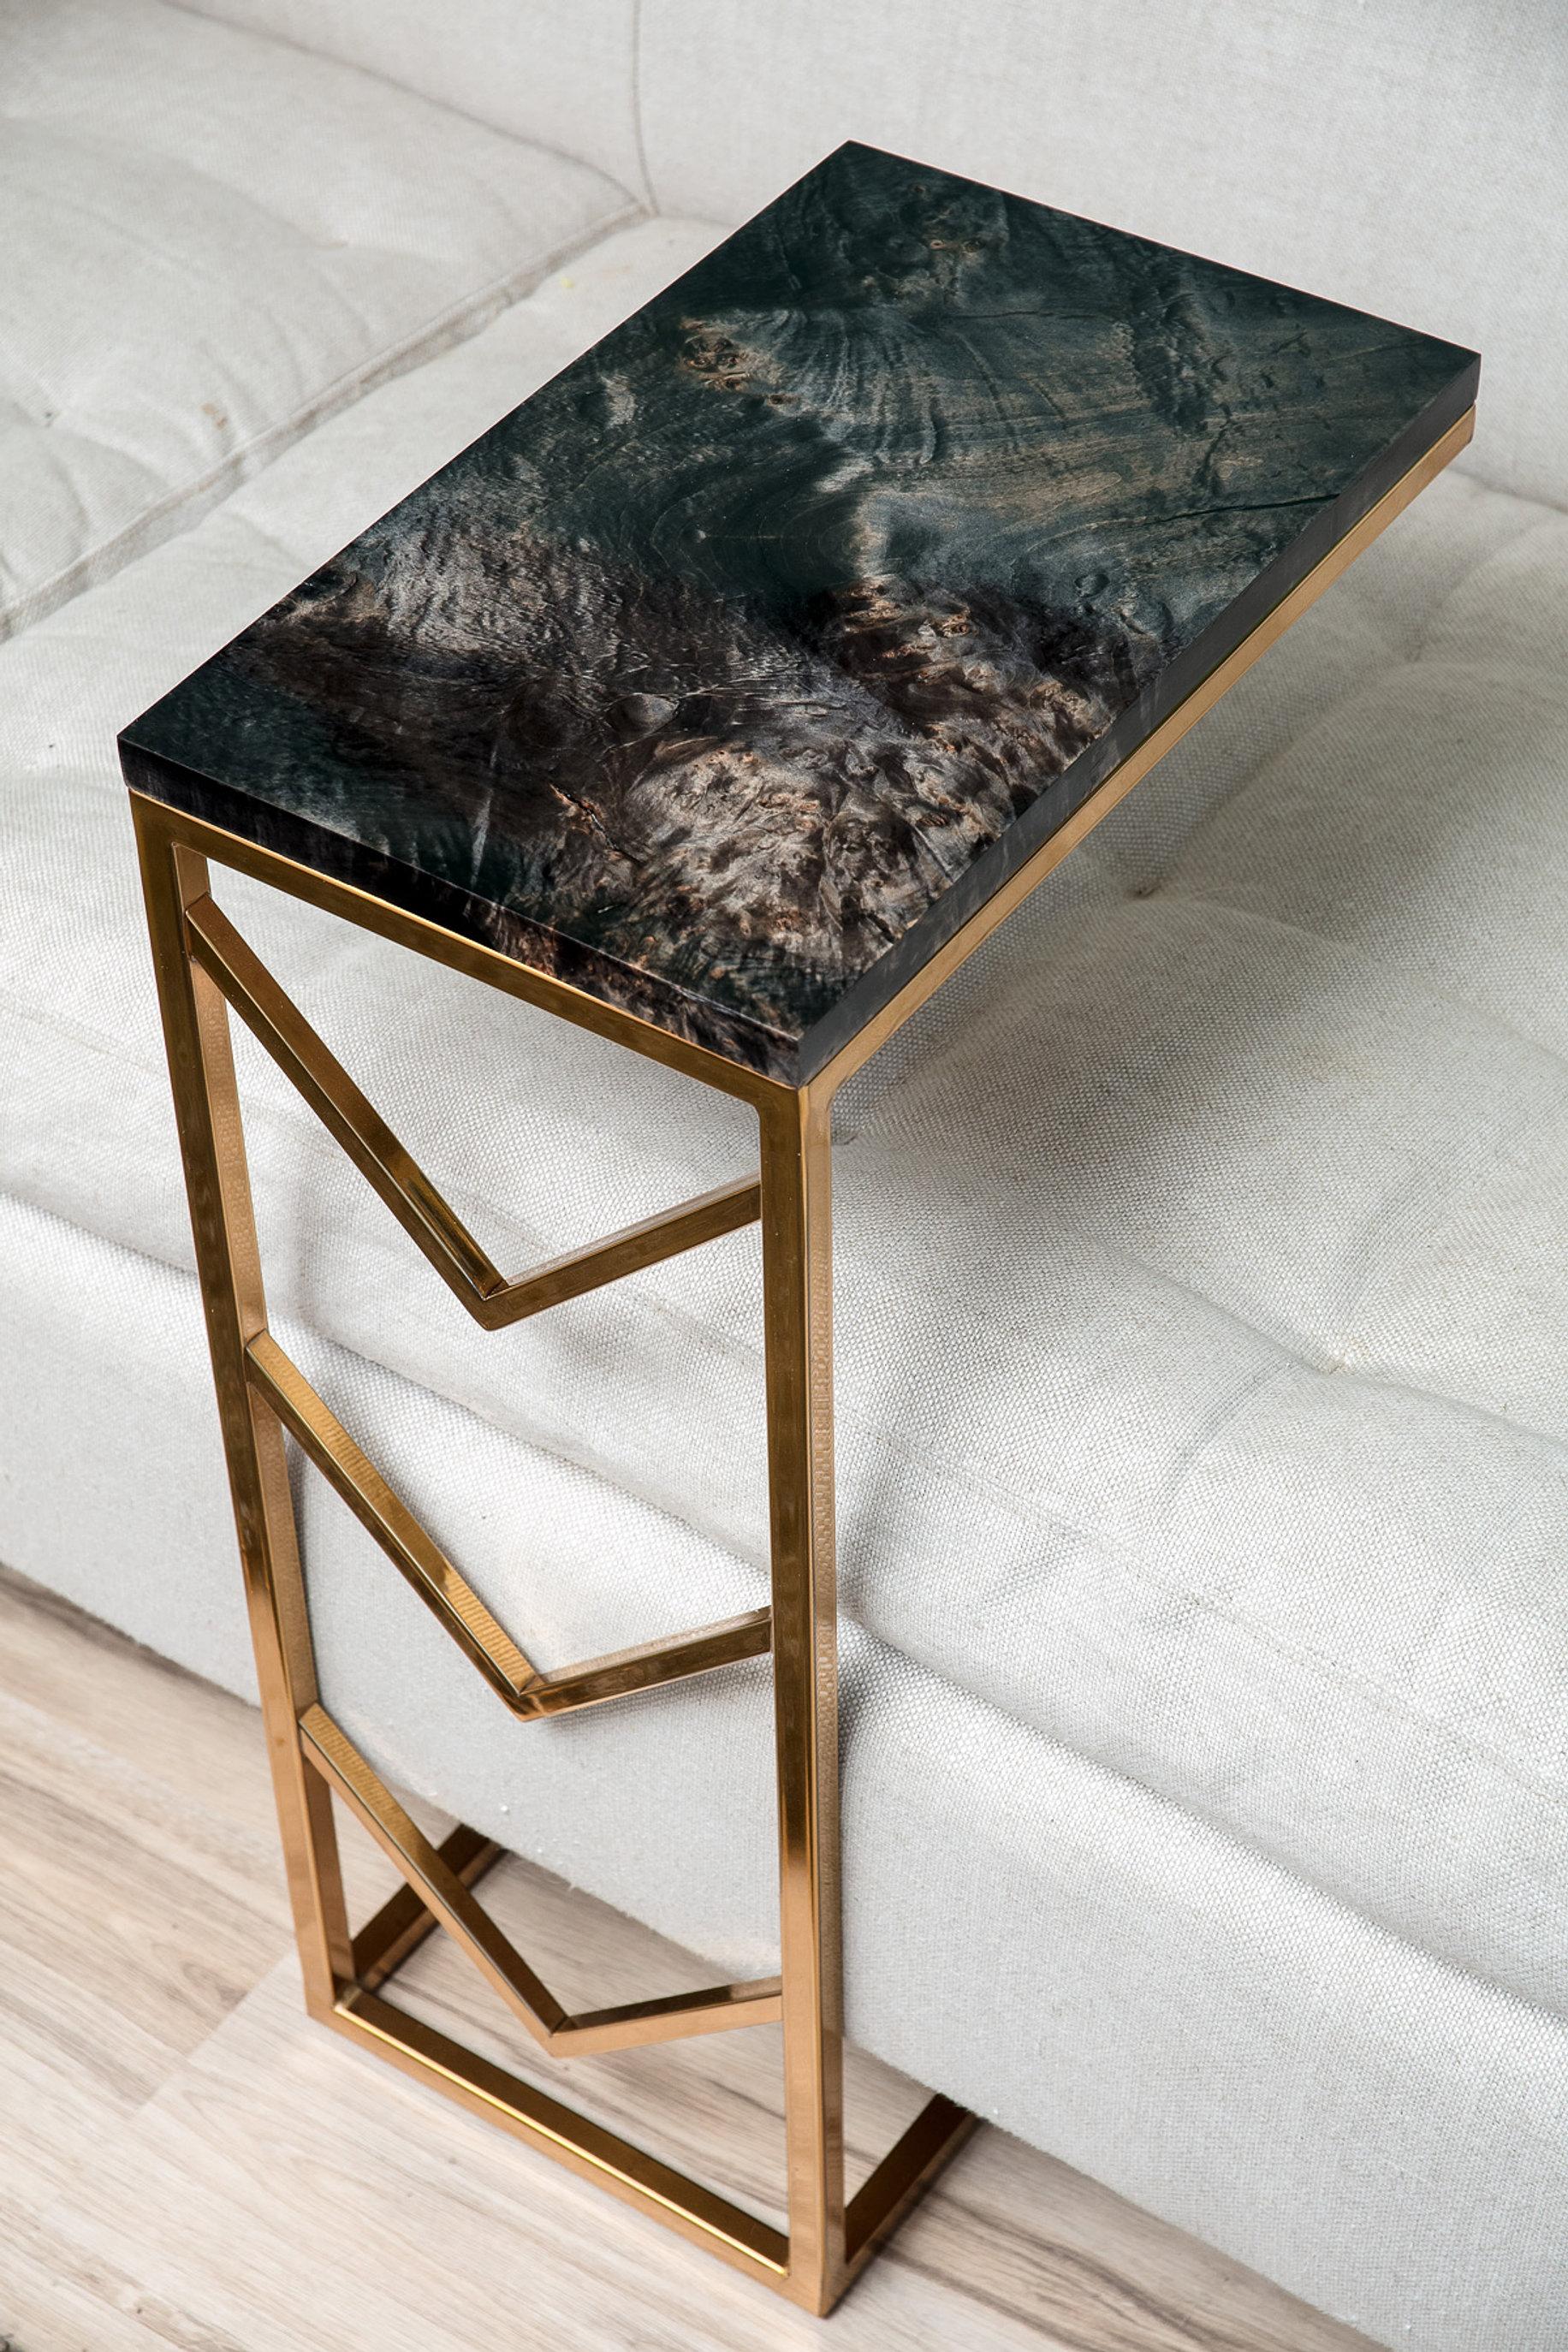 LumberLust Designs